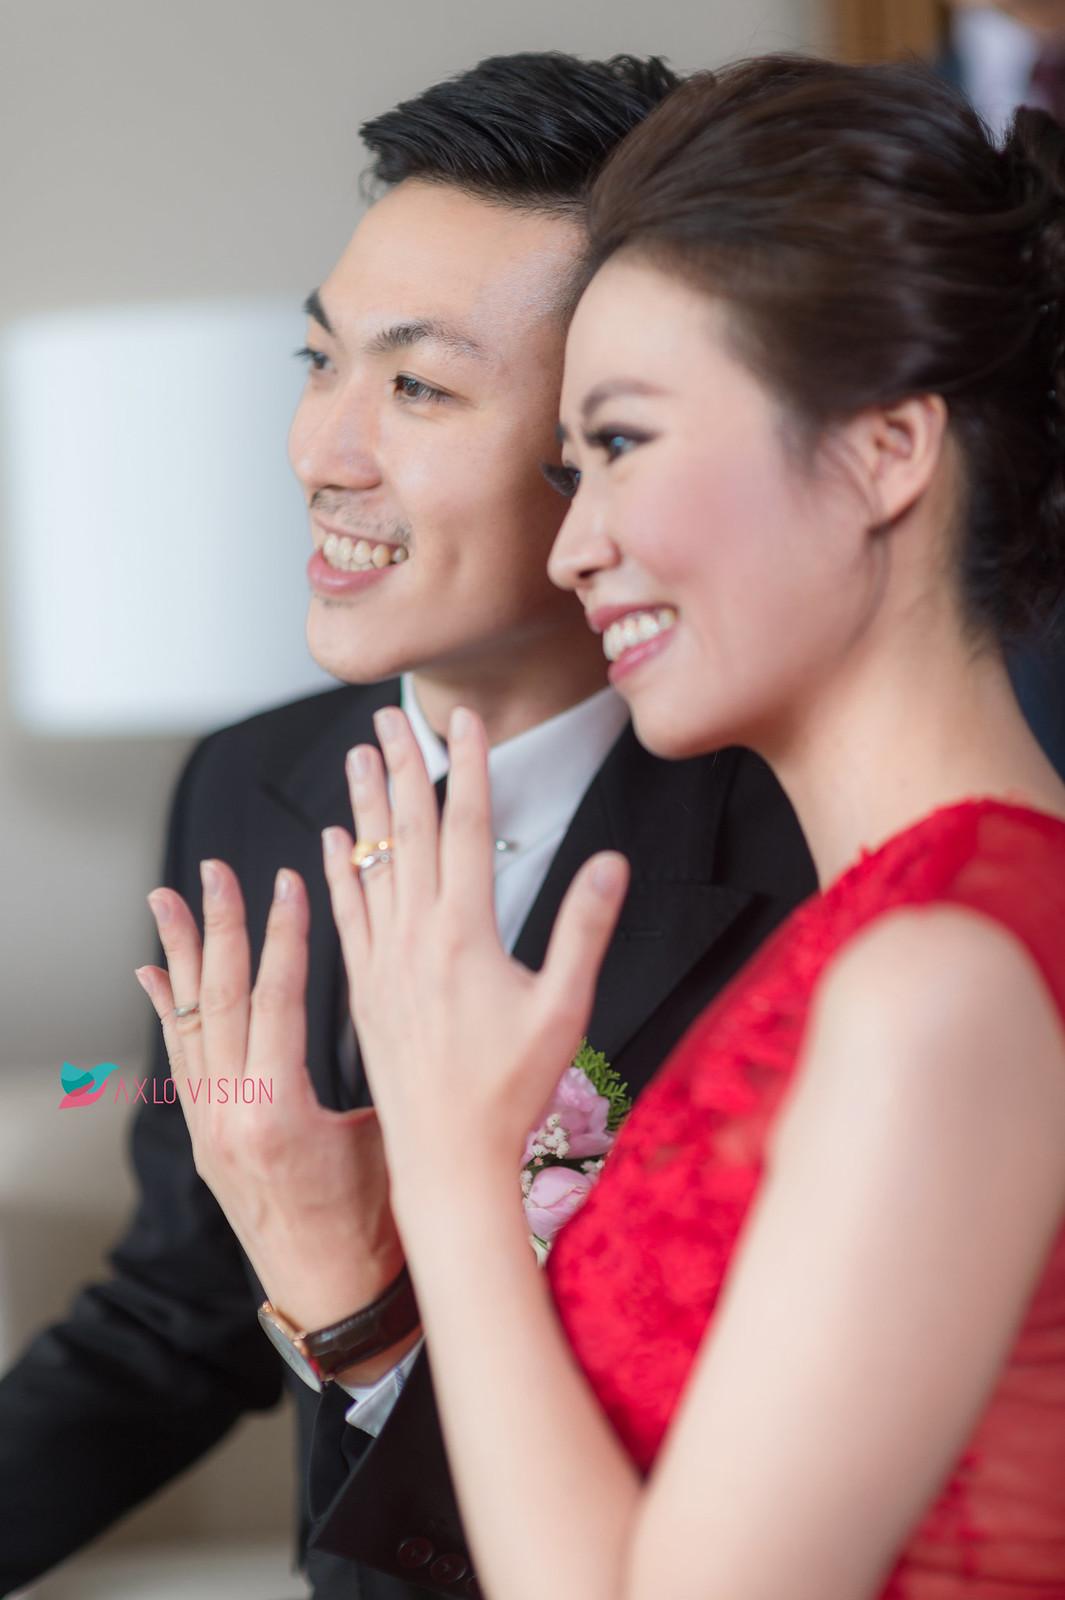 20170916 WeddingDay_040